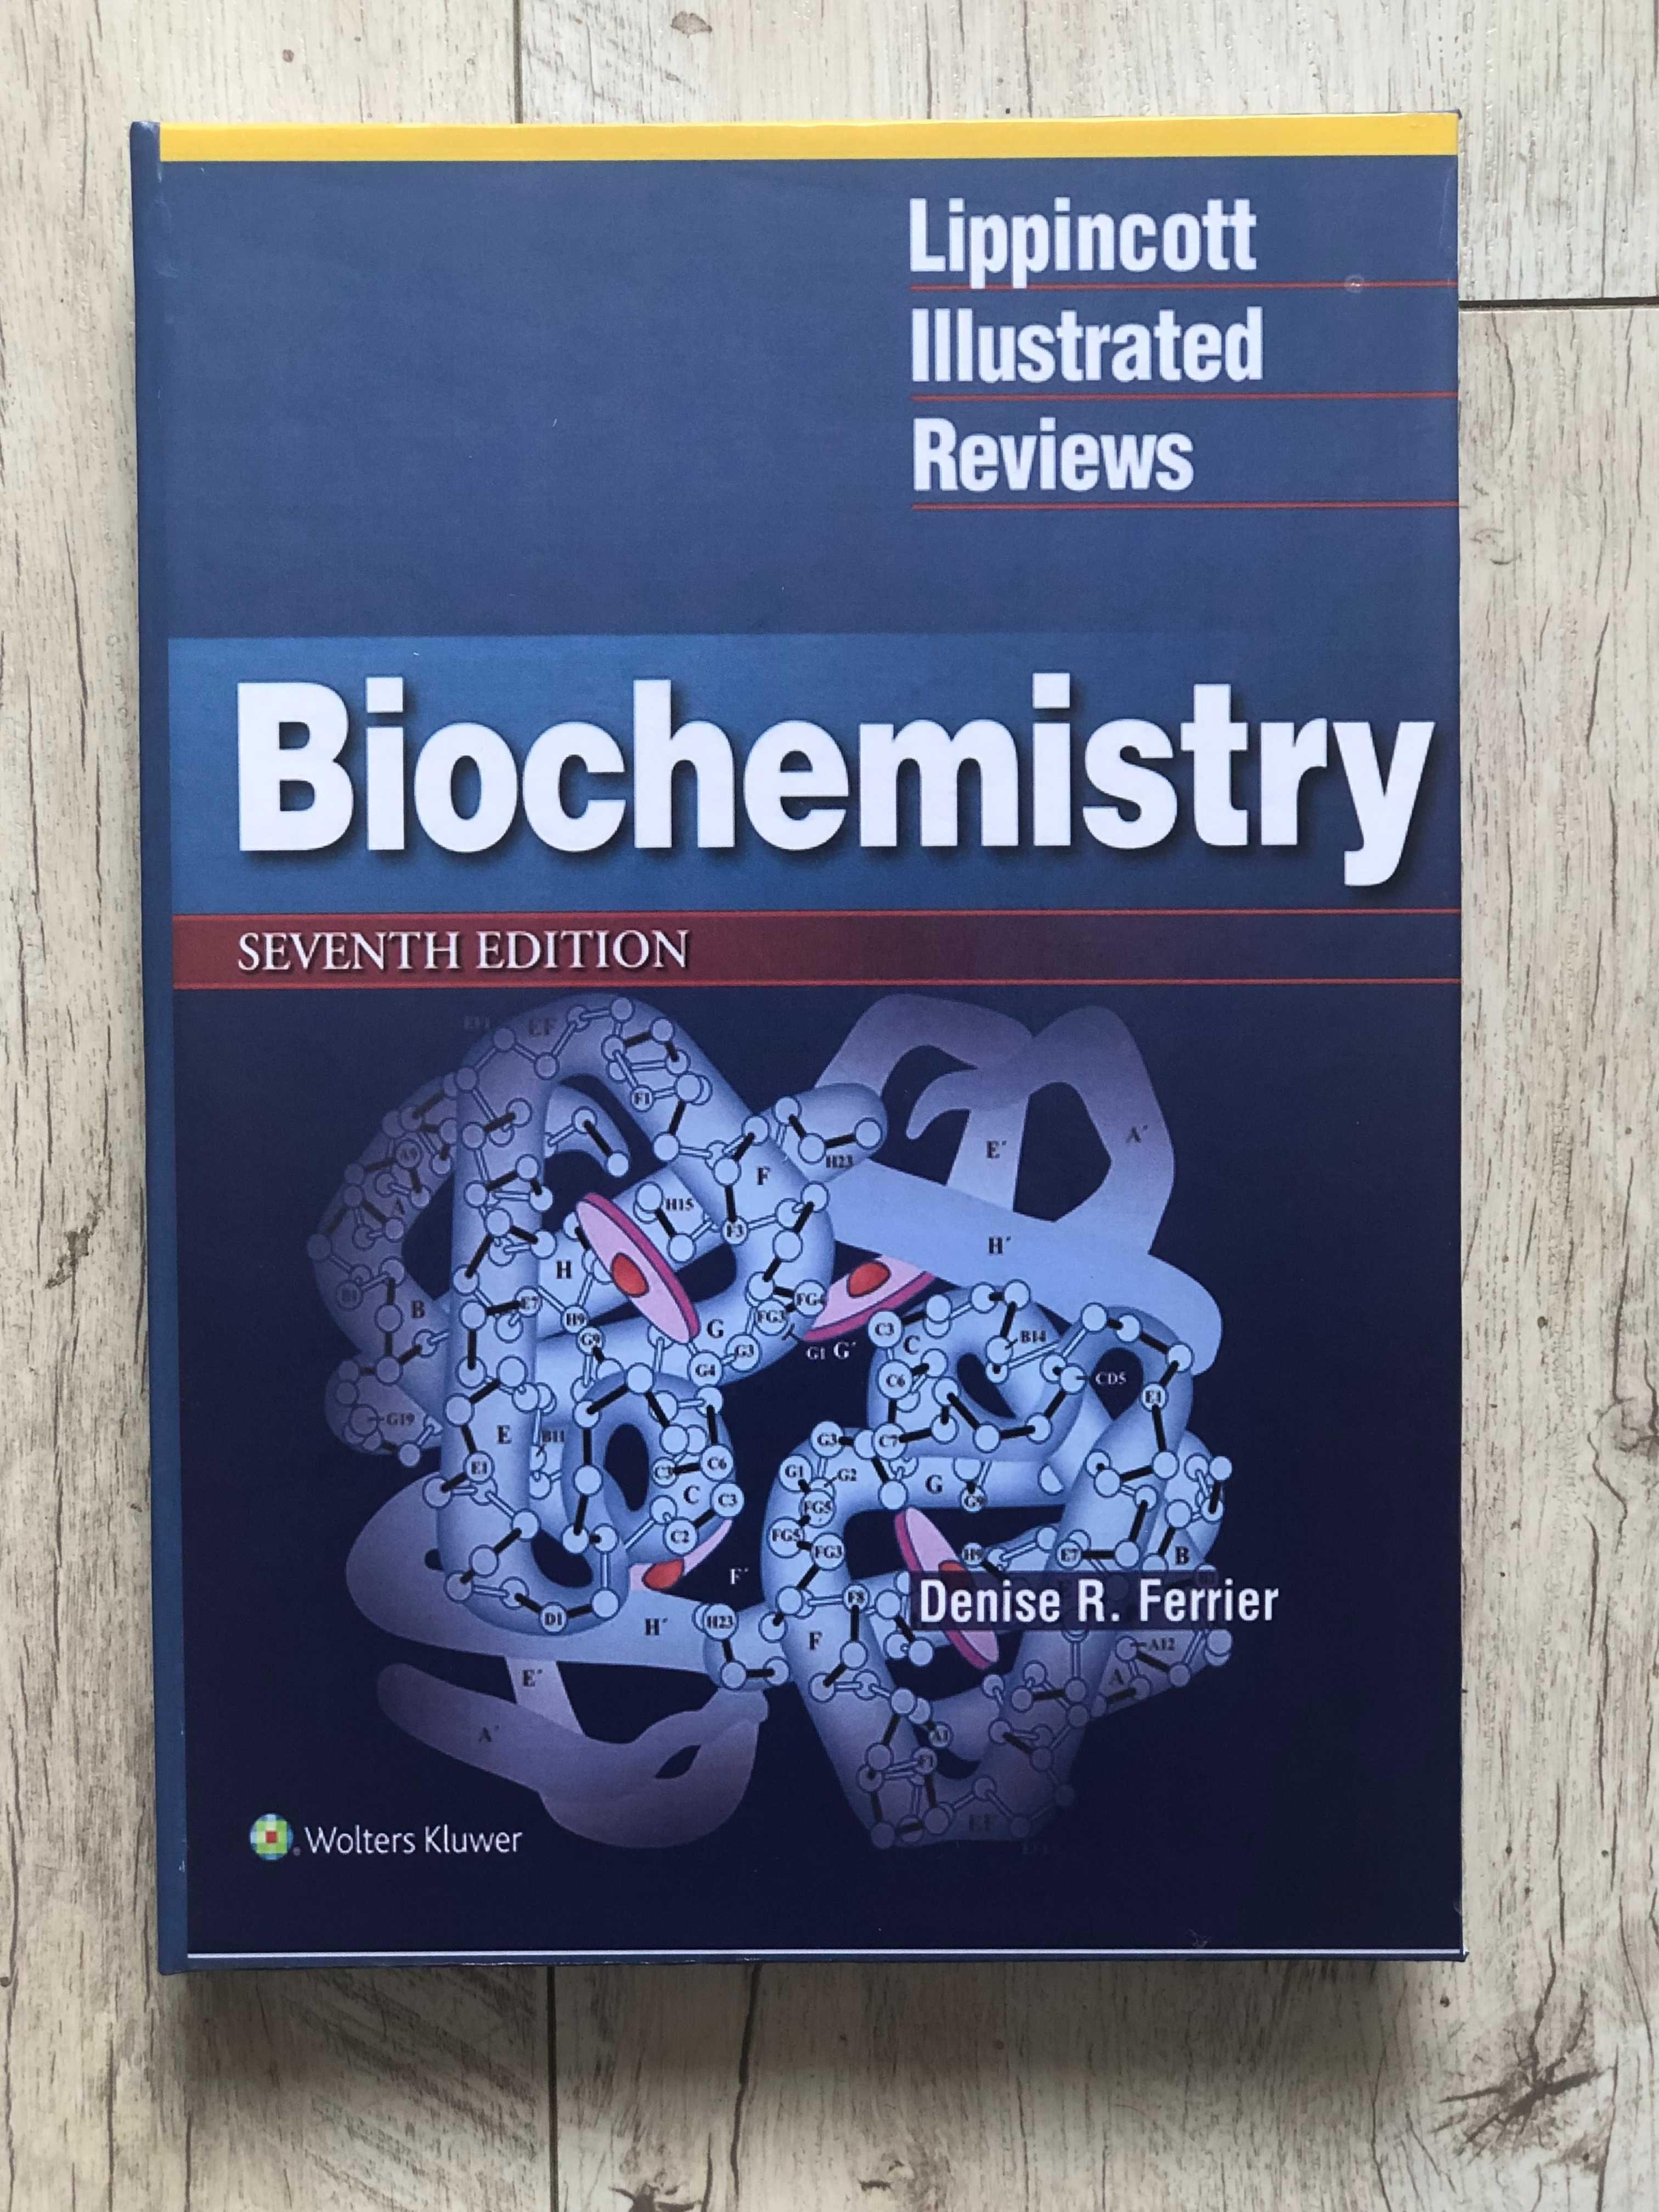 Lippincott's Illustrated Reviews: Biochemistry,7th/USMLE/IFOM/Биохимия